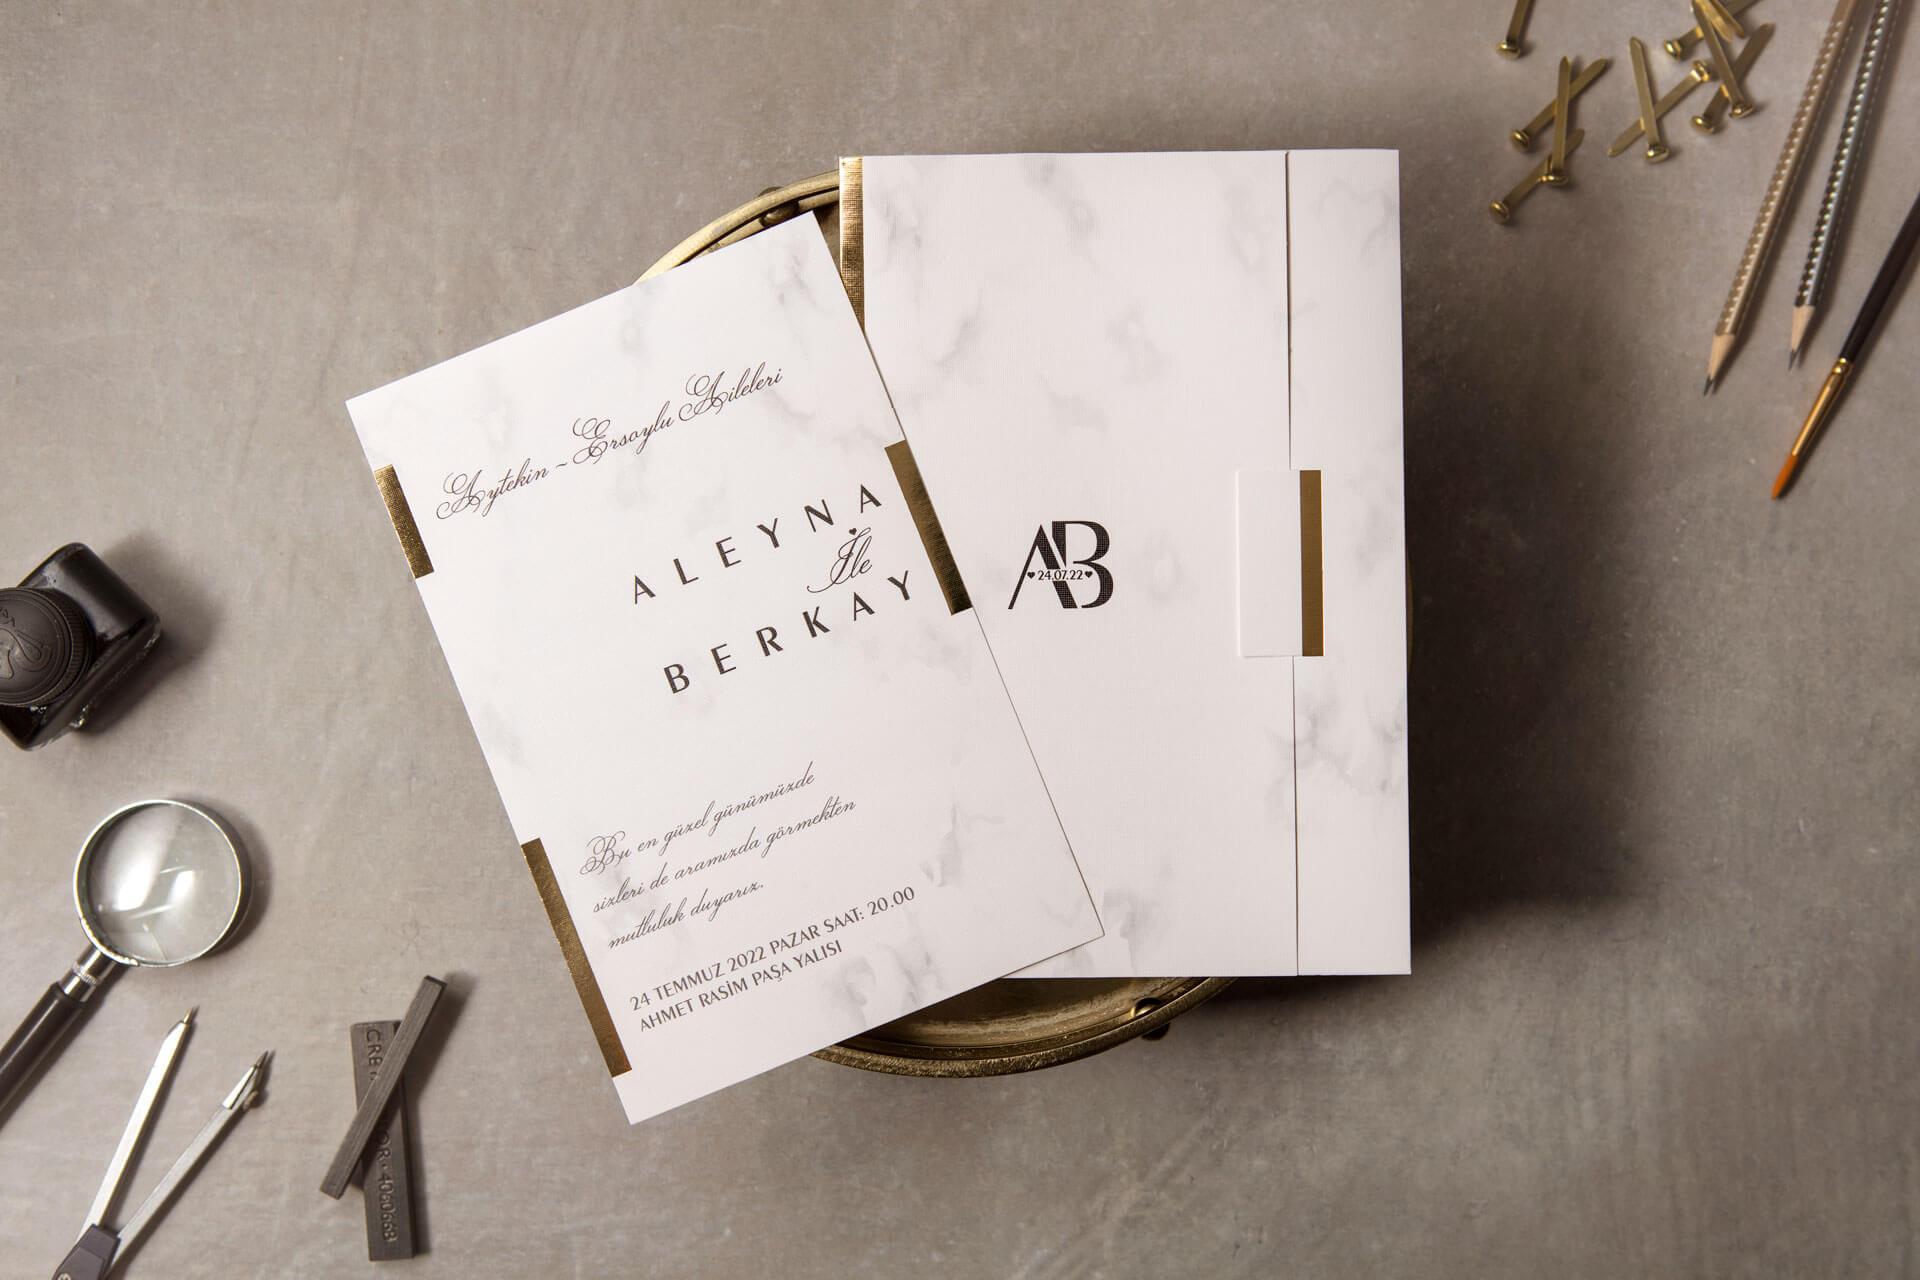 mermer-zeminli-düğün-davetiyesi-8395-2